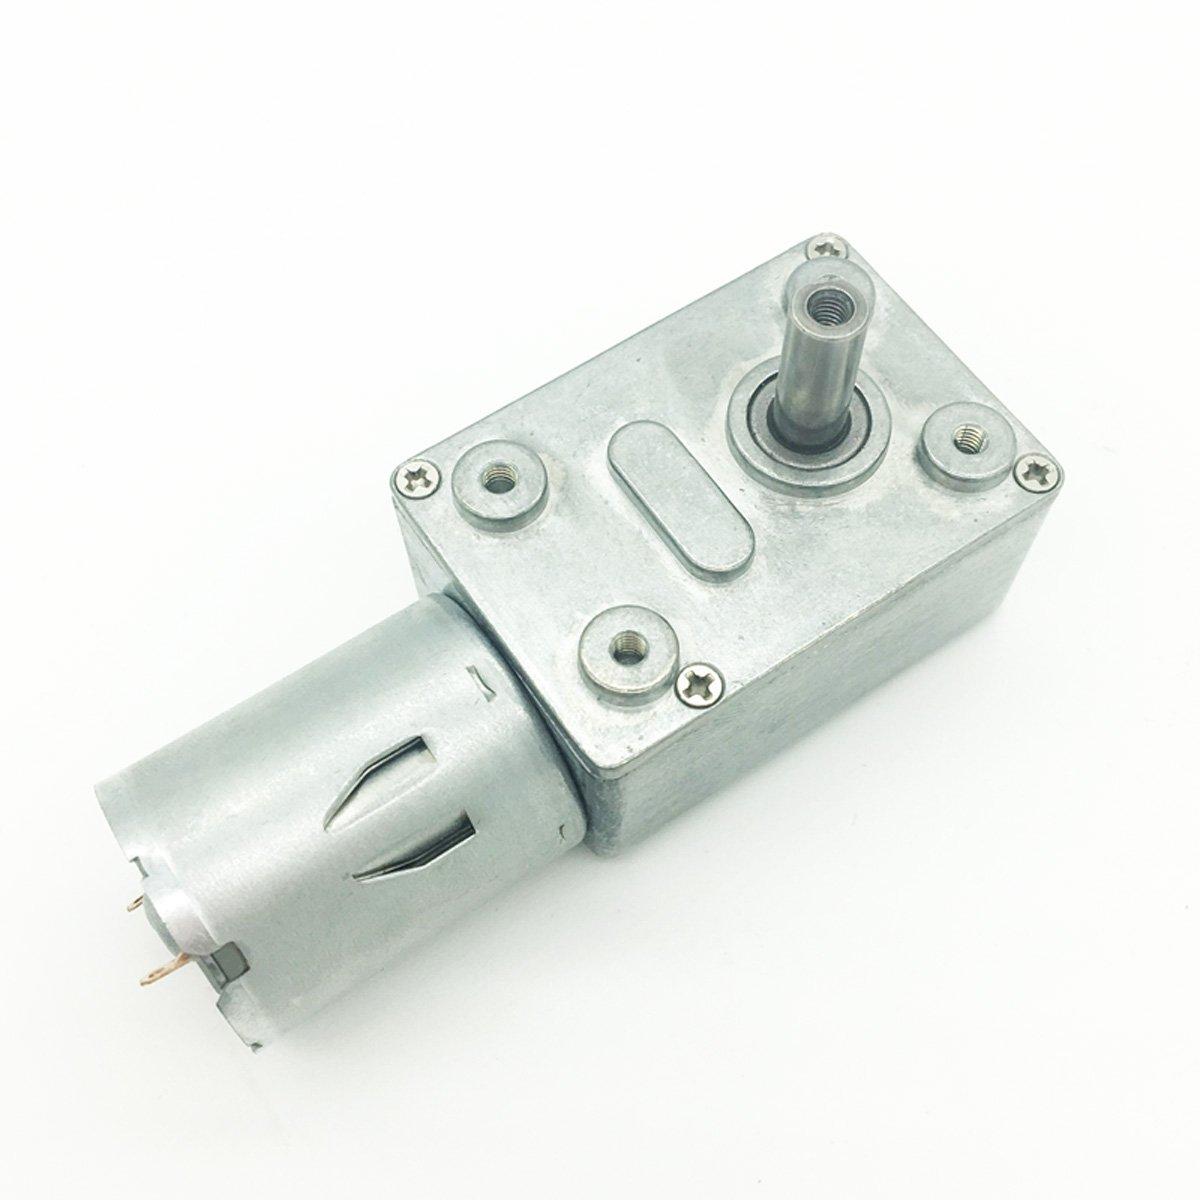 Bringsmart JGY-370 12V 10rpm DC Worm Gear Motor 12 Volt High Torque Engine Mini Turbine Worm 6-24V Reducer Electric Motor Self-locking for DIY Mini Geared Motor (JGY-370 12V 10rpm)